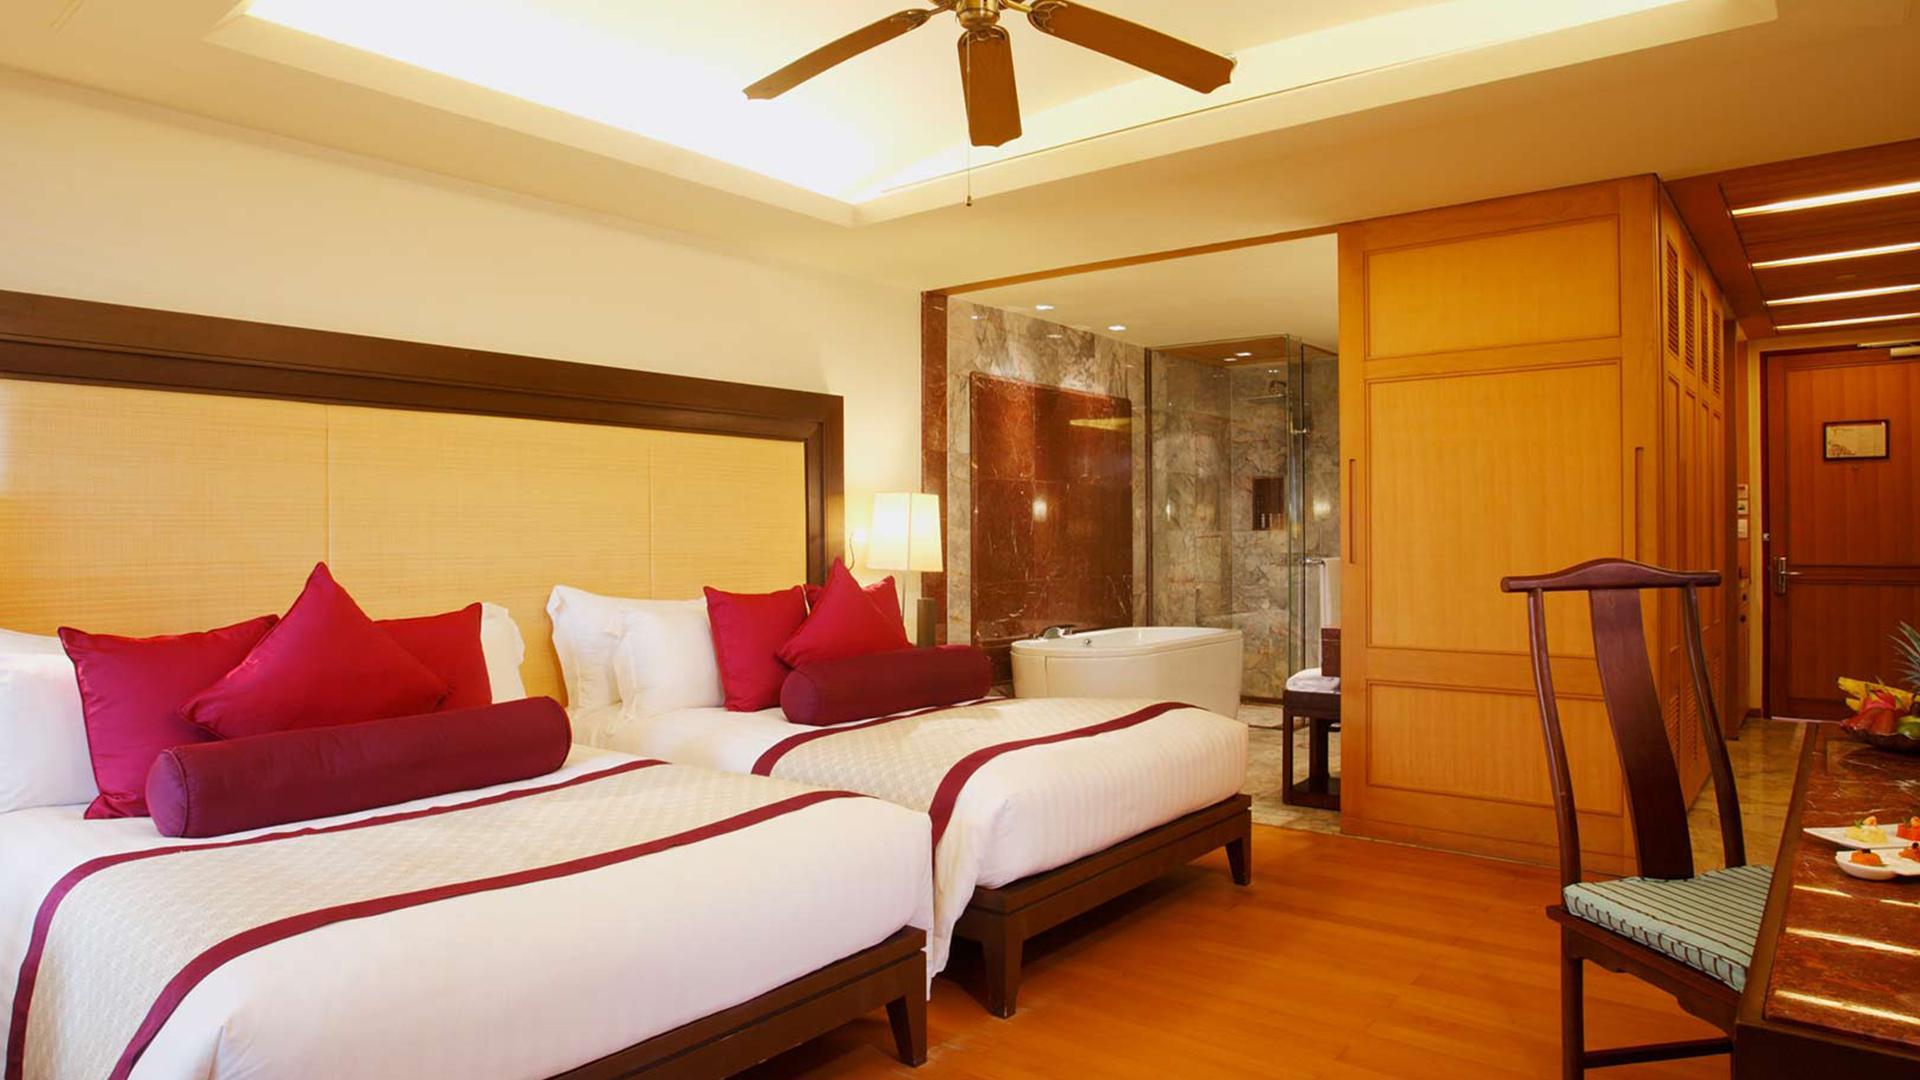 Deluxe Family Garden Room image 1 at Centara Grand Beach Resort Phuket by อำเภอเมืองภูเก็ต, Phuket, Thailand